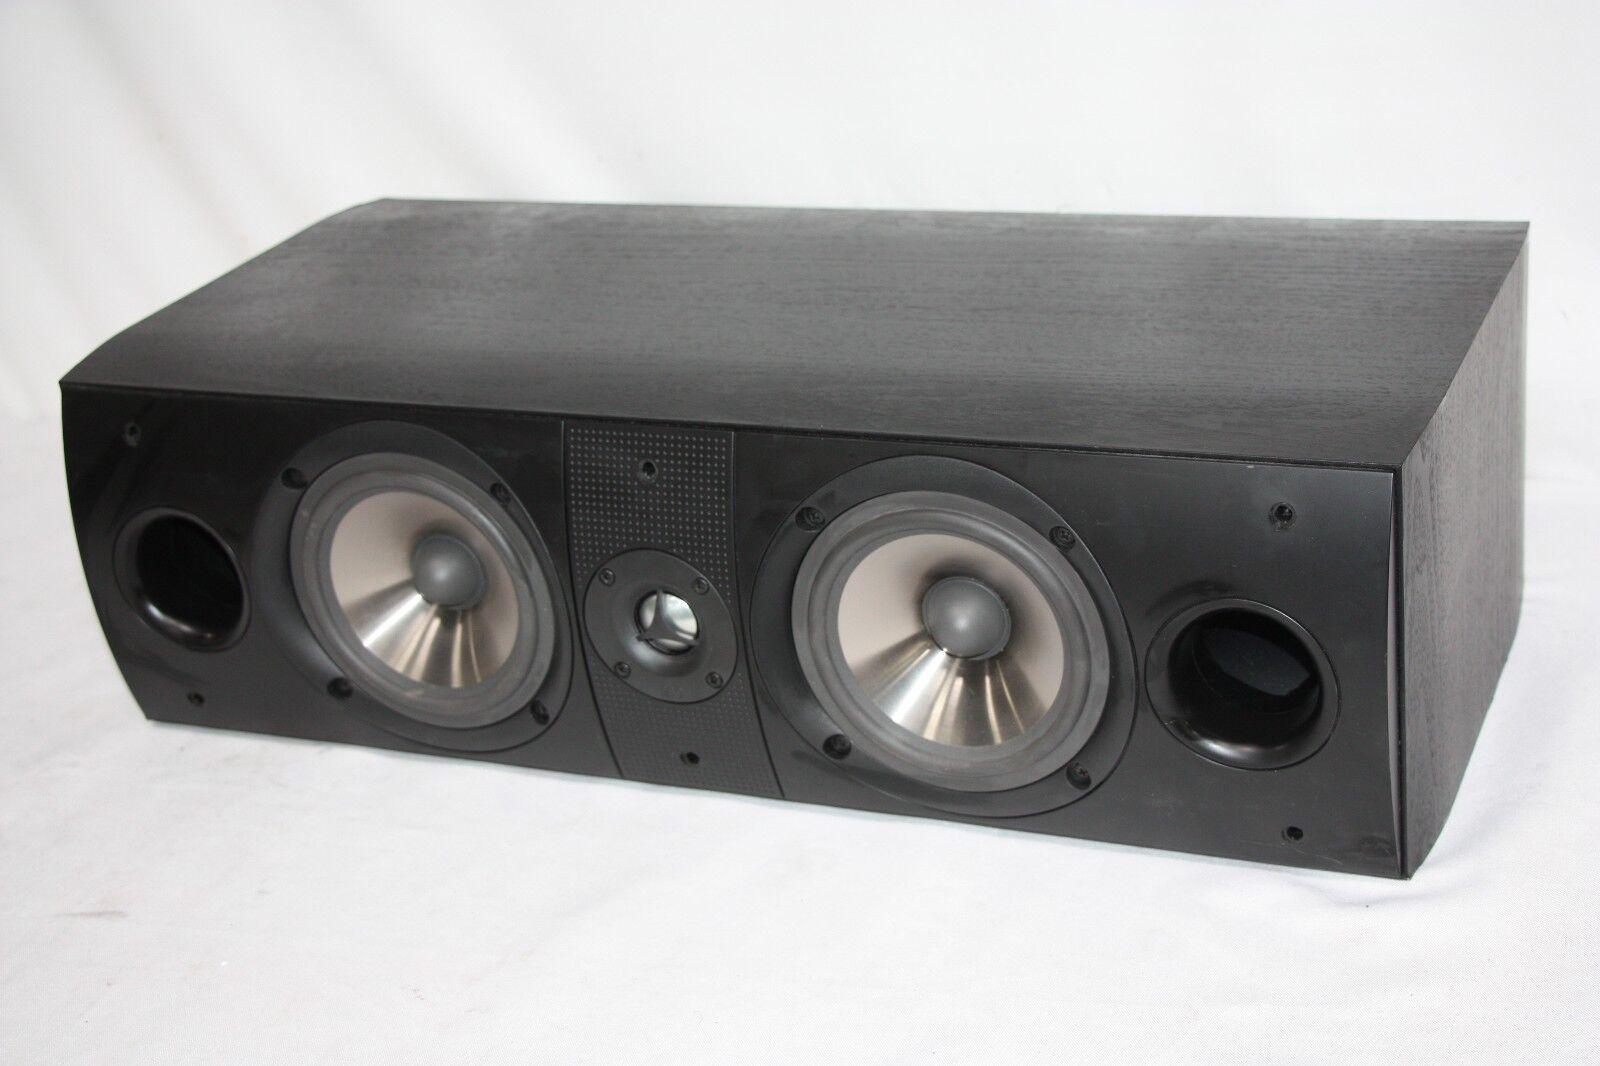 Psb Image C40 Center Channel Speaker